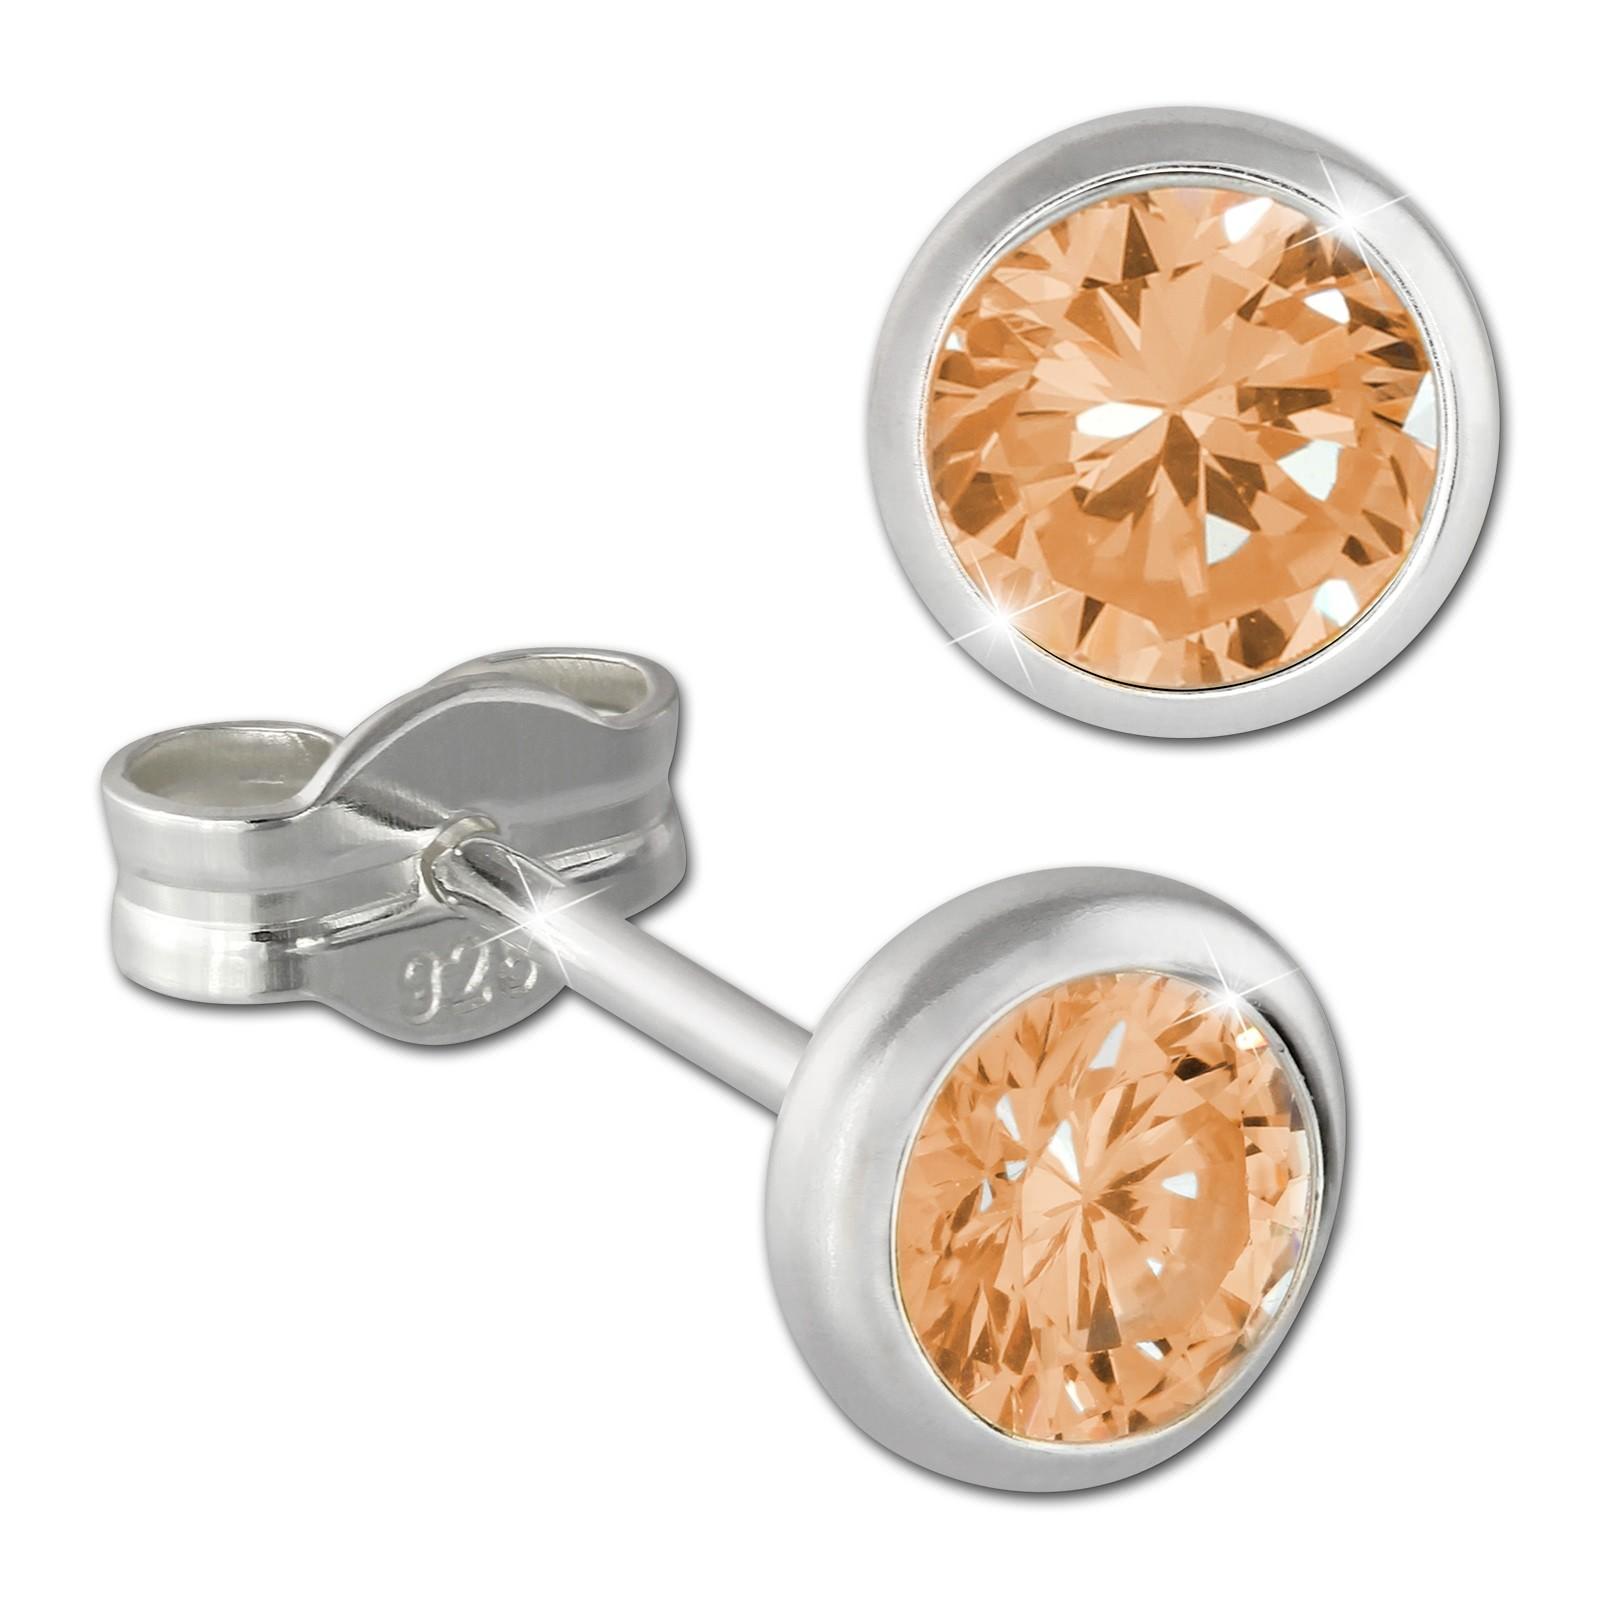 SilberDream Ohrring Zirkonia gelb 5mm 925 Silber Ohrstecker SDO5535Y